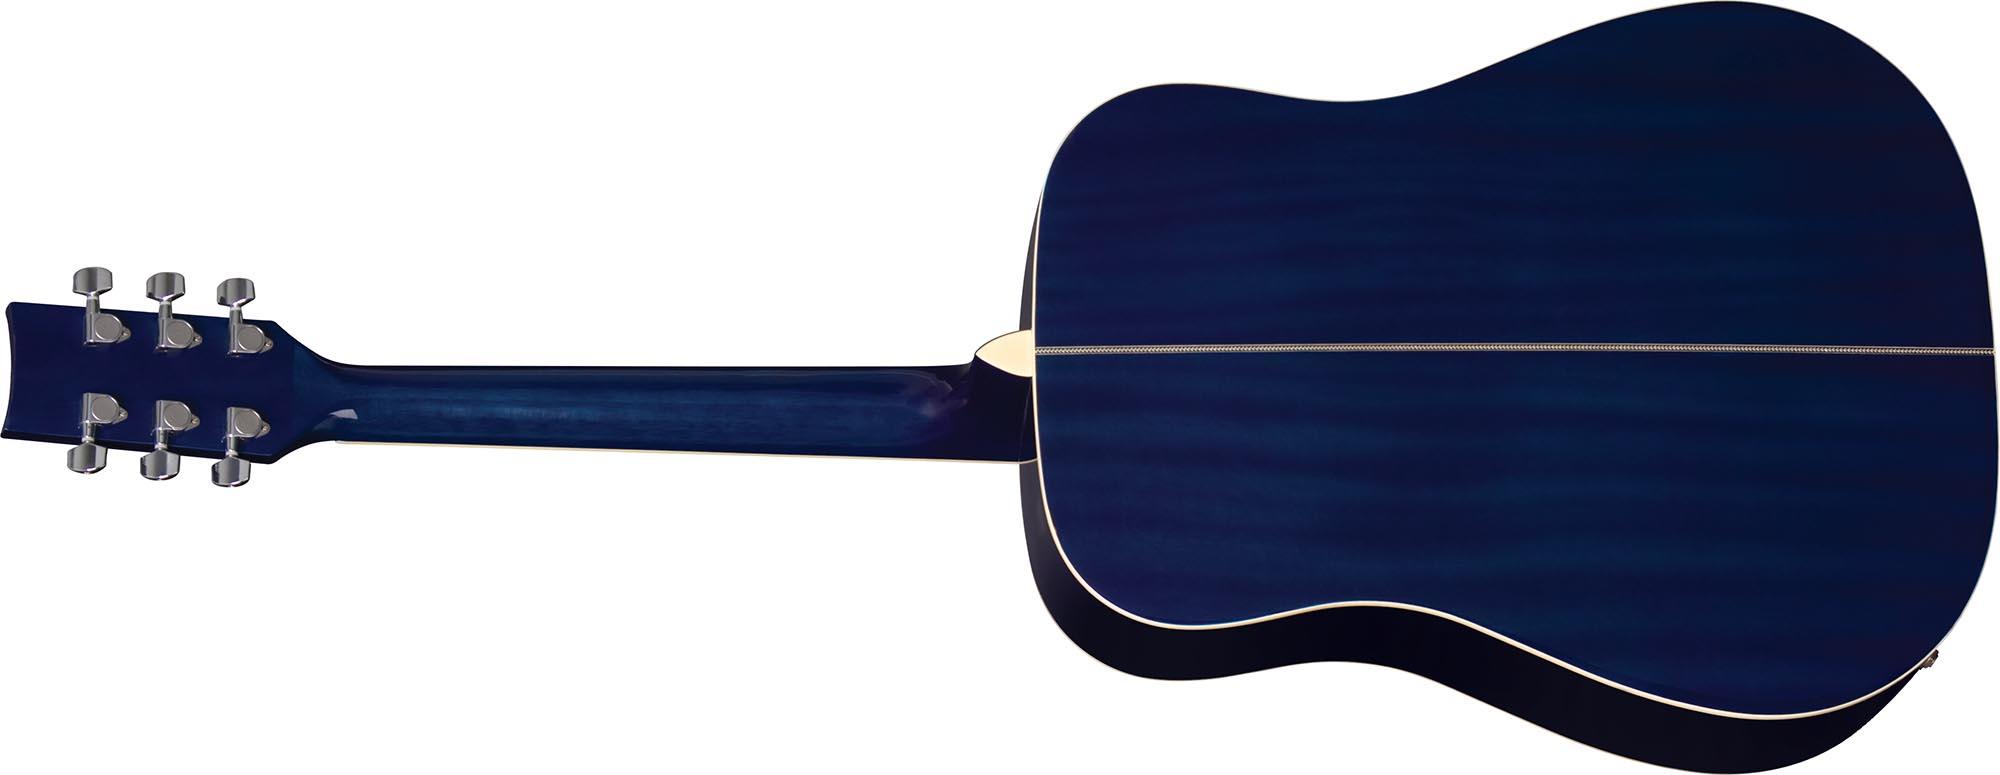 ch887 violao folk dreadnought eagle pro series ch887 bls azul sunburst visao posterior